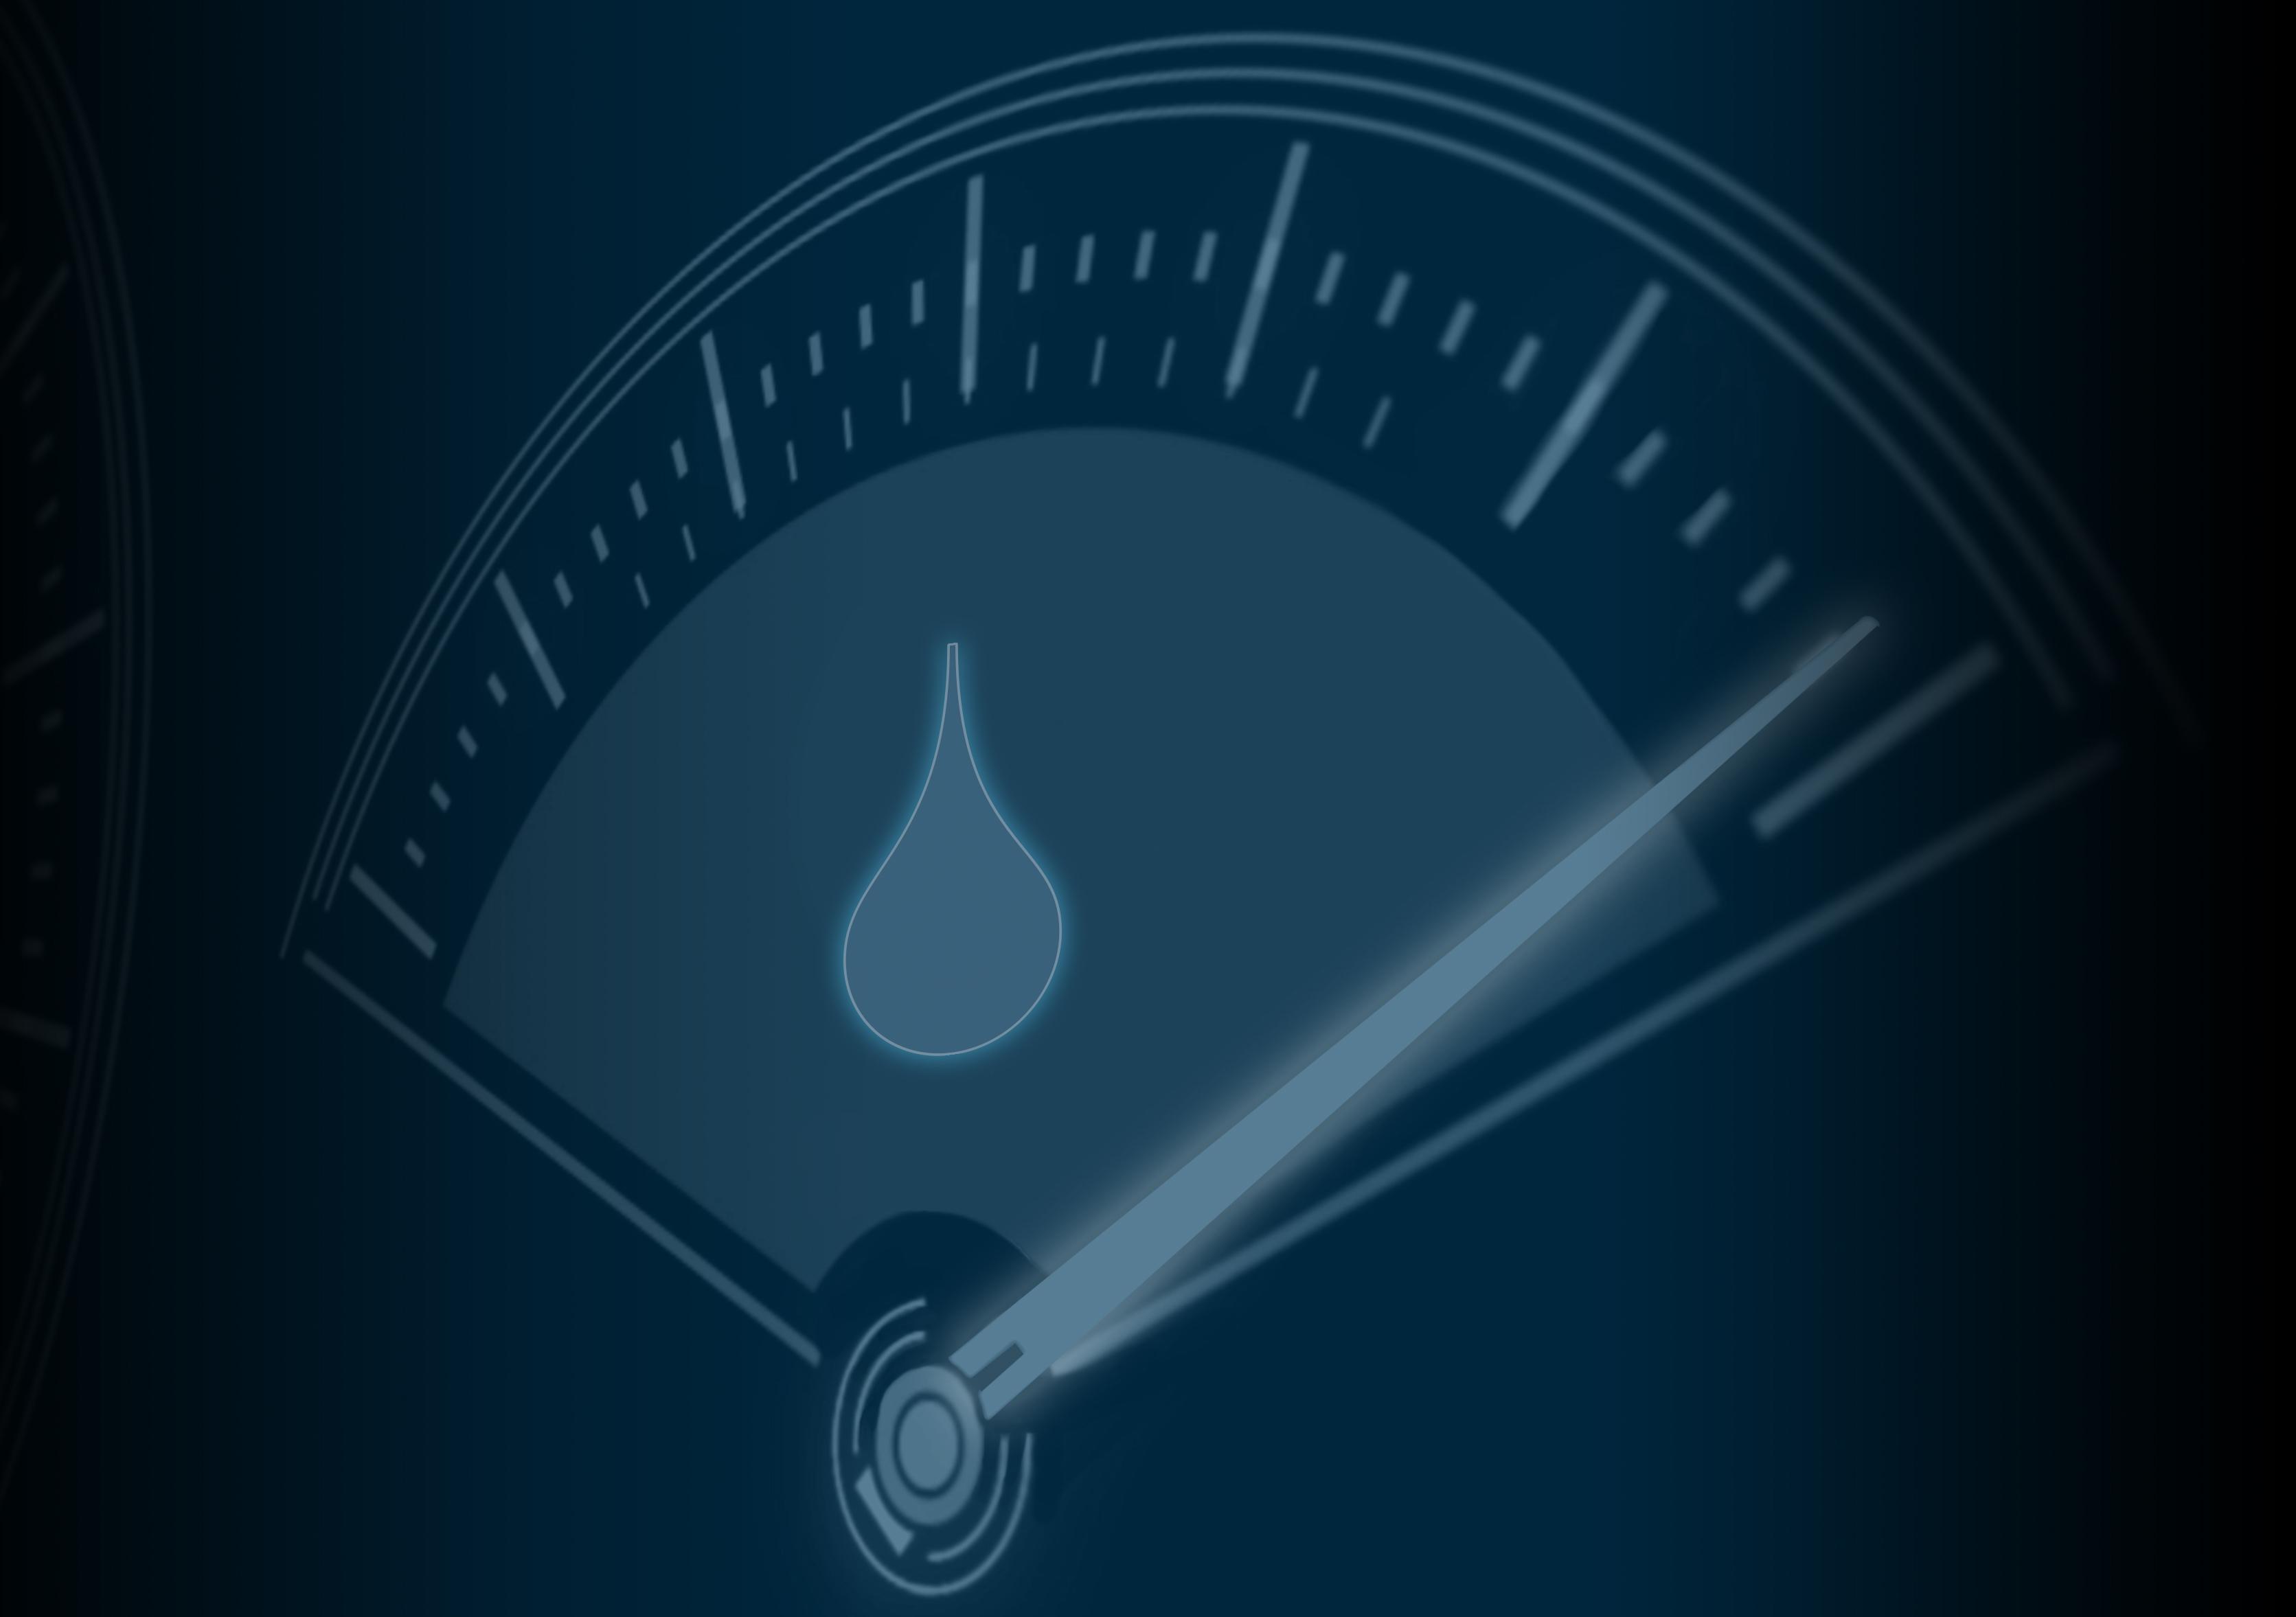 Speedometer_finalfinal_0 copy.jpg